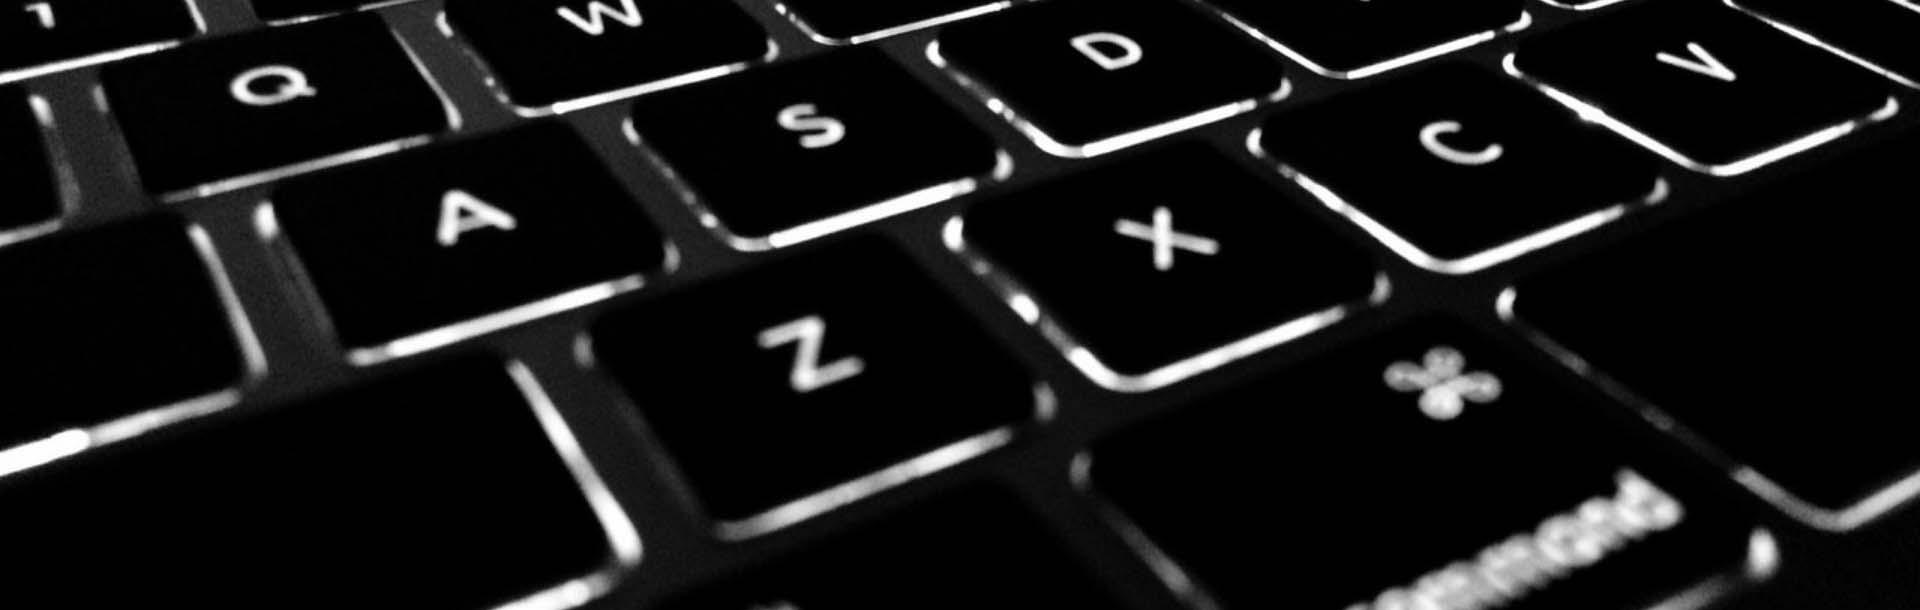 bg-dark-keyboard